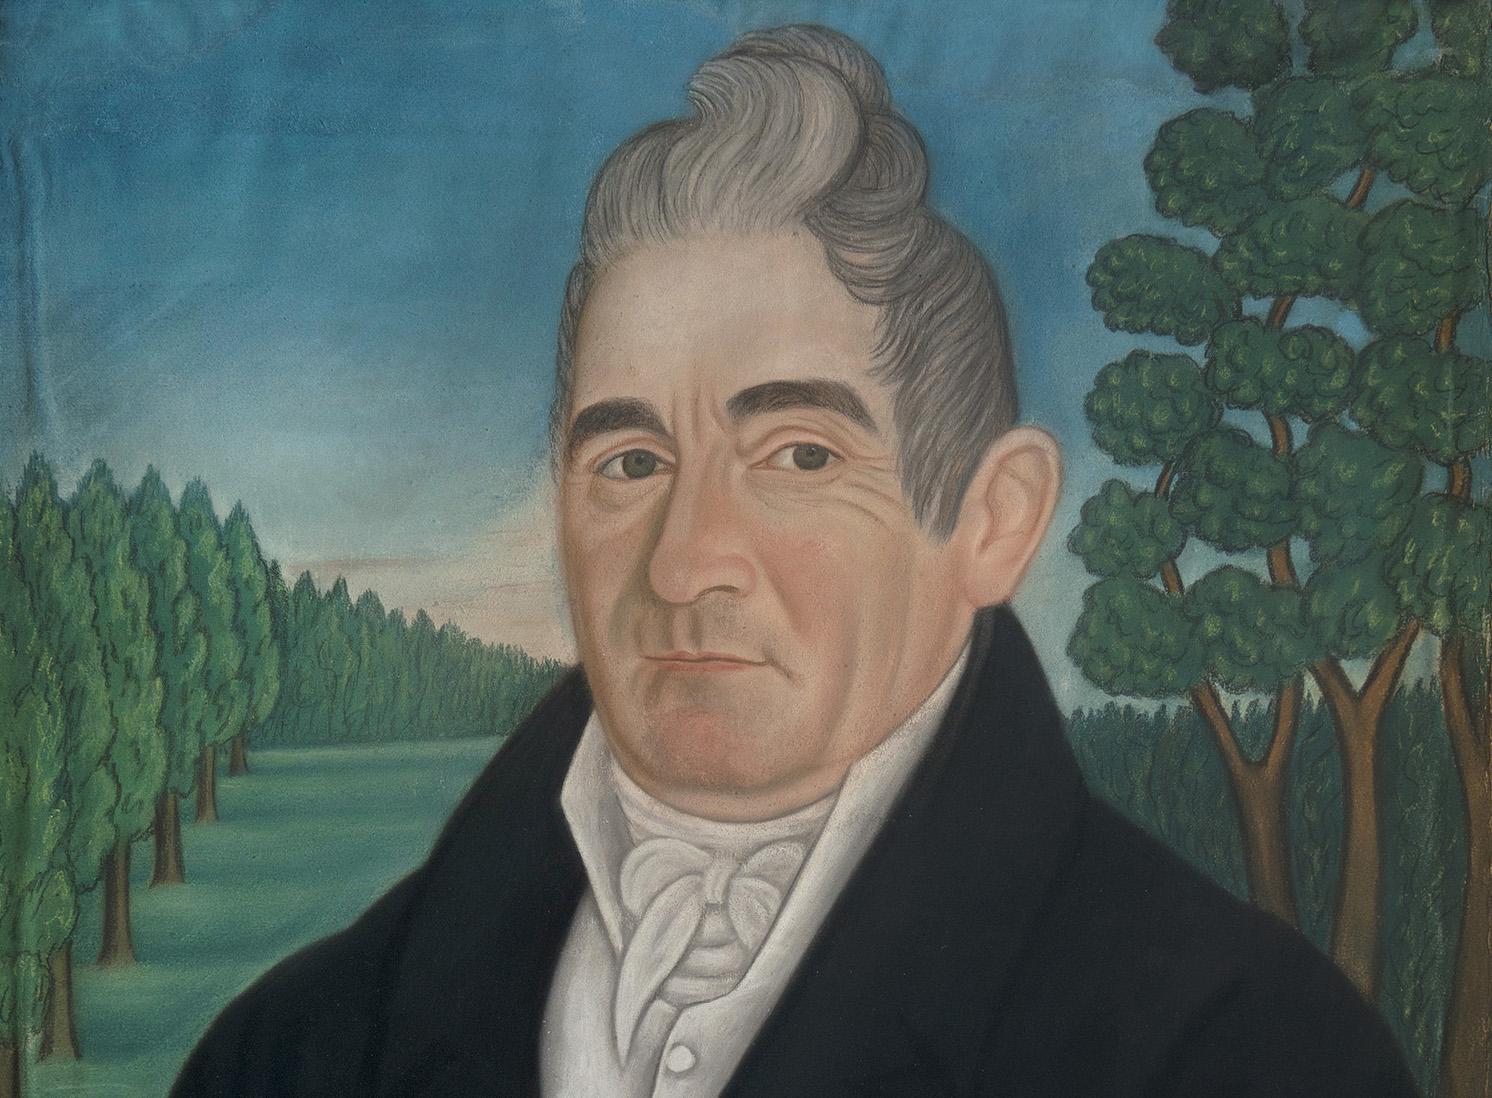 Image Credit: George Clarke (b. 1764). Micah Williams (1782-1837). Pastel on paper. Collection of Edward King, Jr.